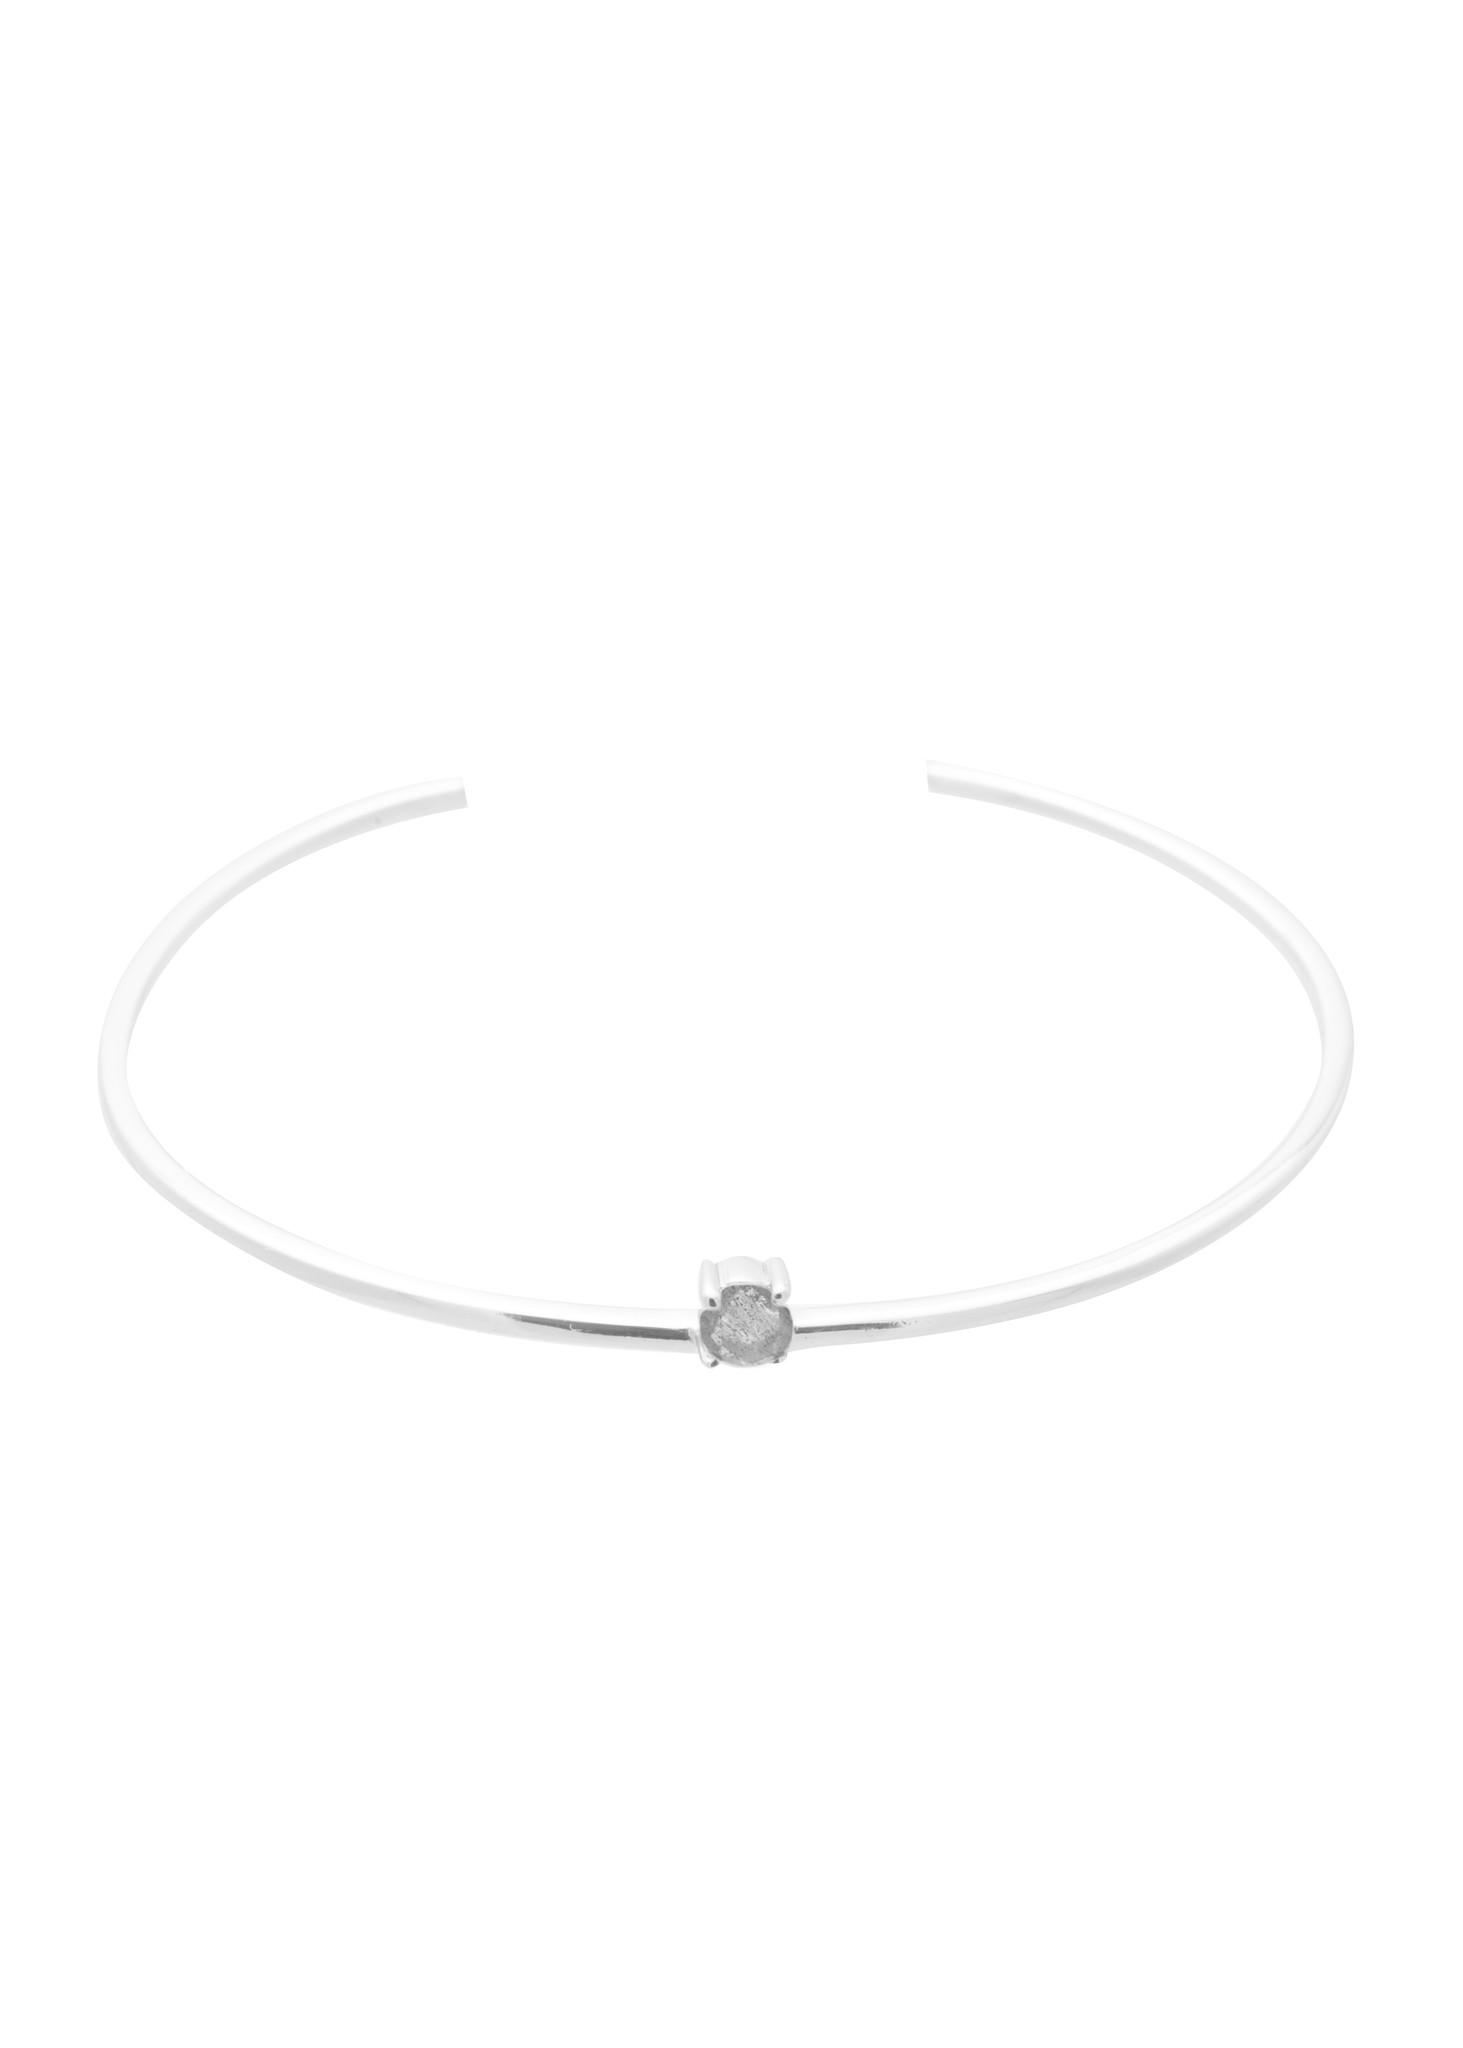 Sarah Mulder Jewelry Bracelet Obsession